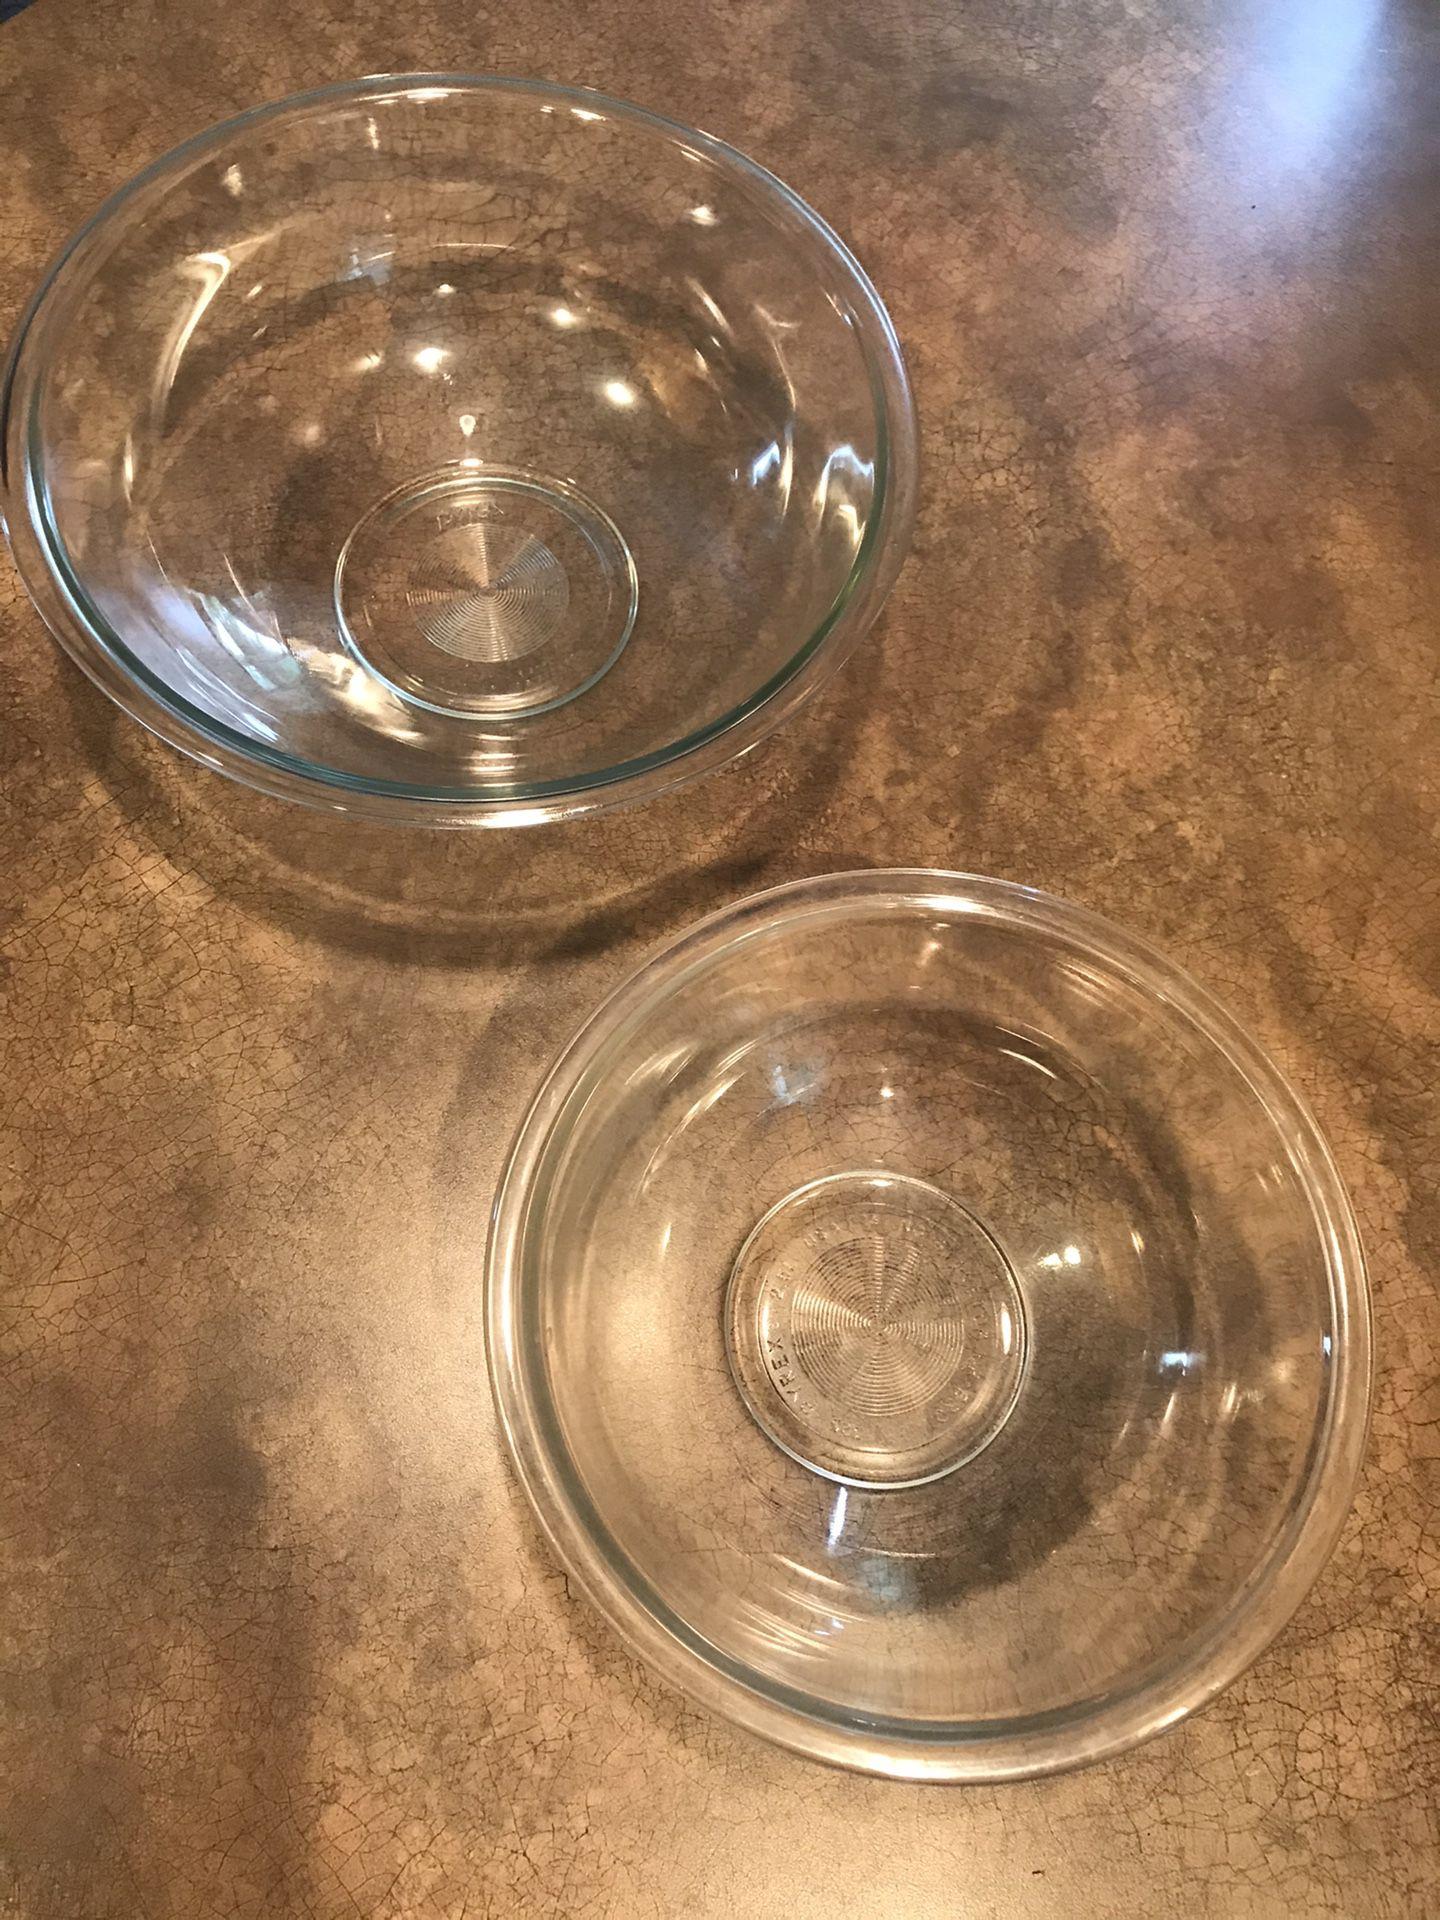 2 large vintage Pyrex nesting baking bowls